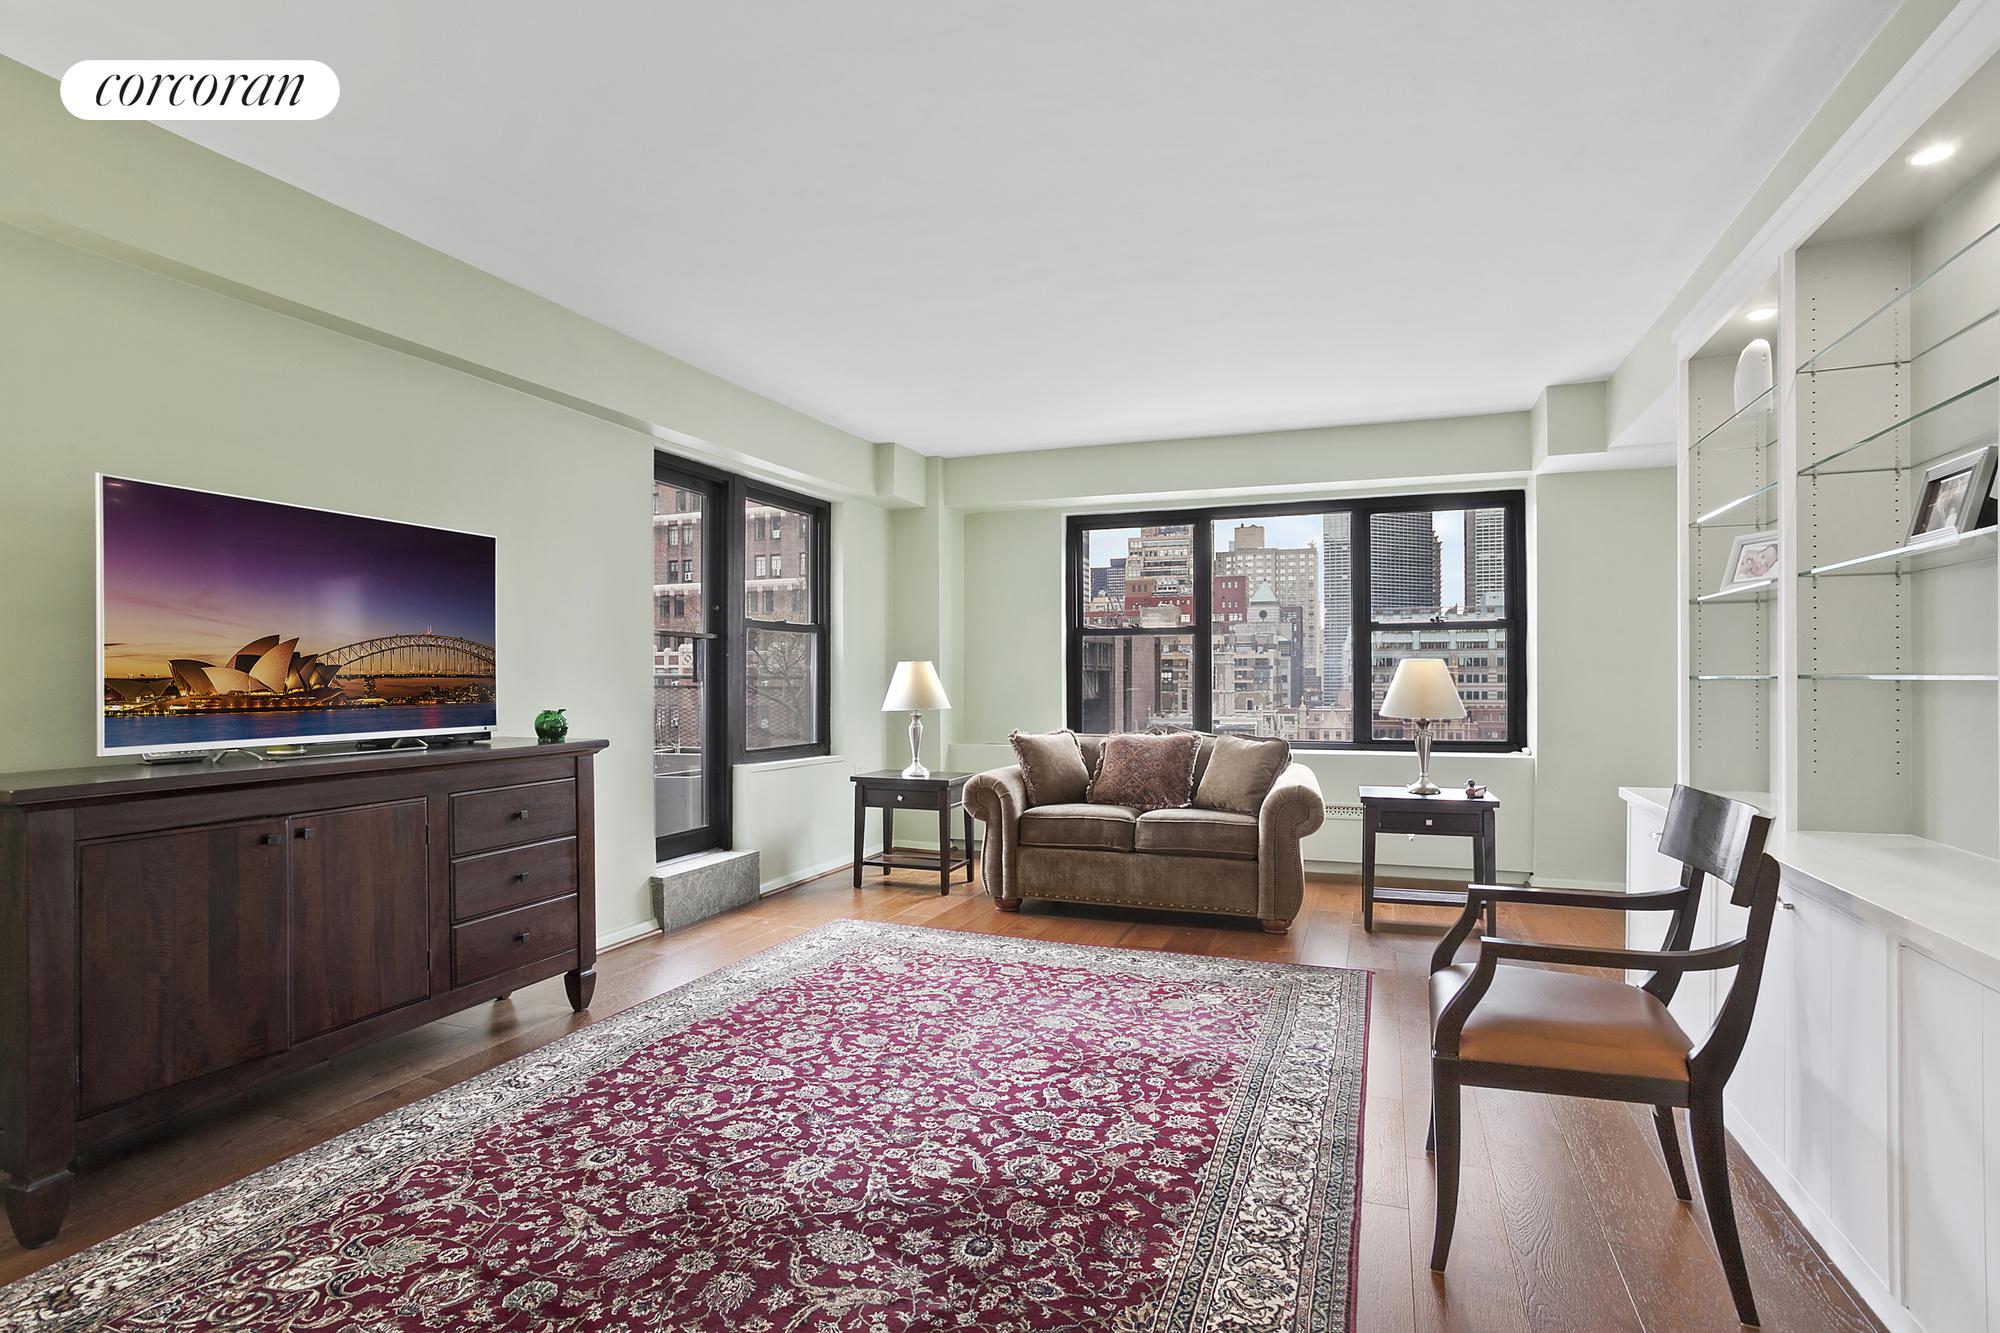 Corcoran Kevin McNeill Village 49 East 10th Street Realtor Real Estate Agent Broker Referral Experience New York Manhattan Brooklyn